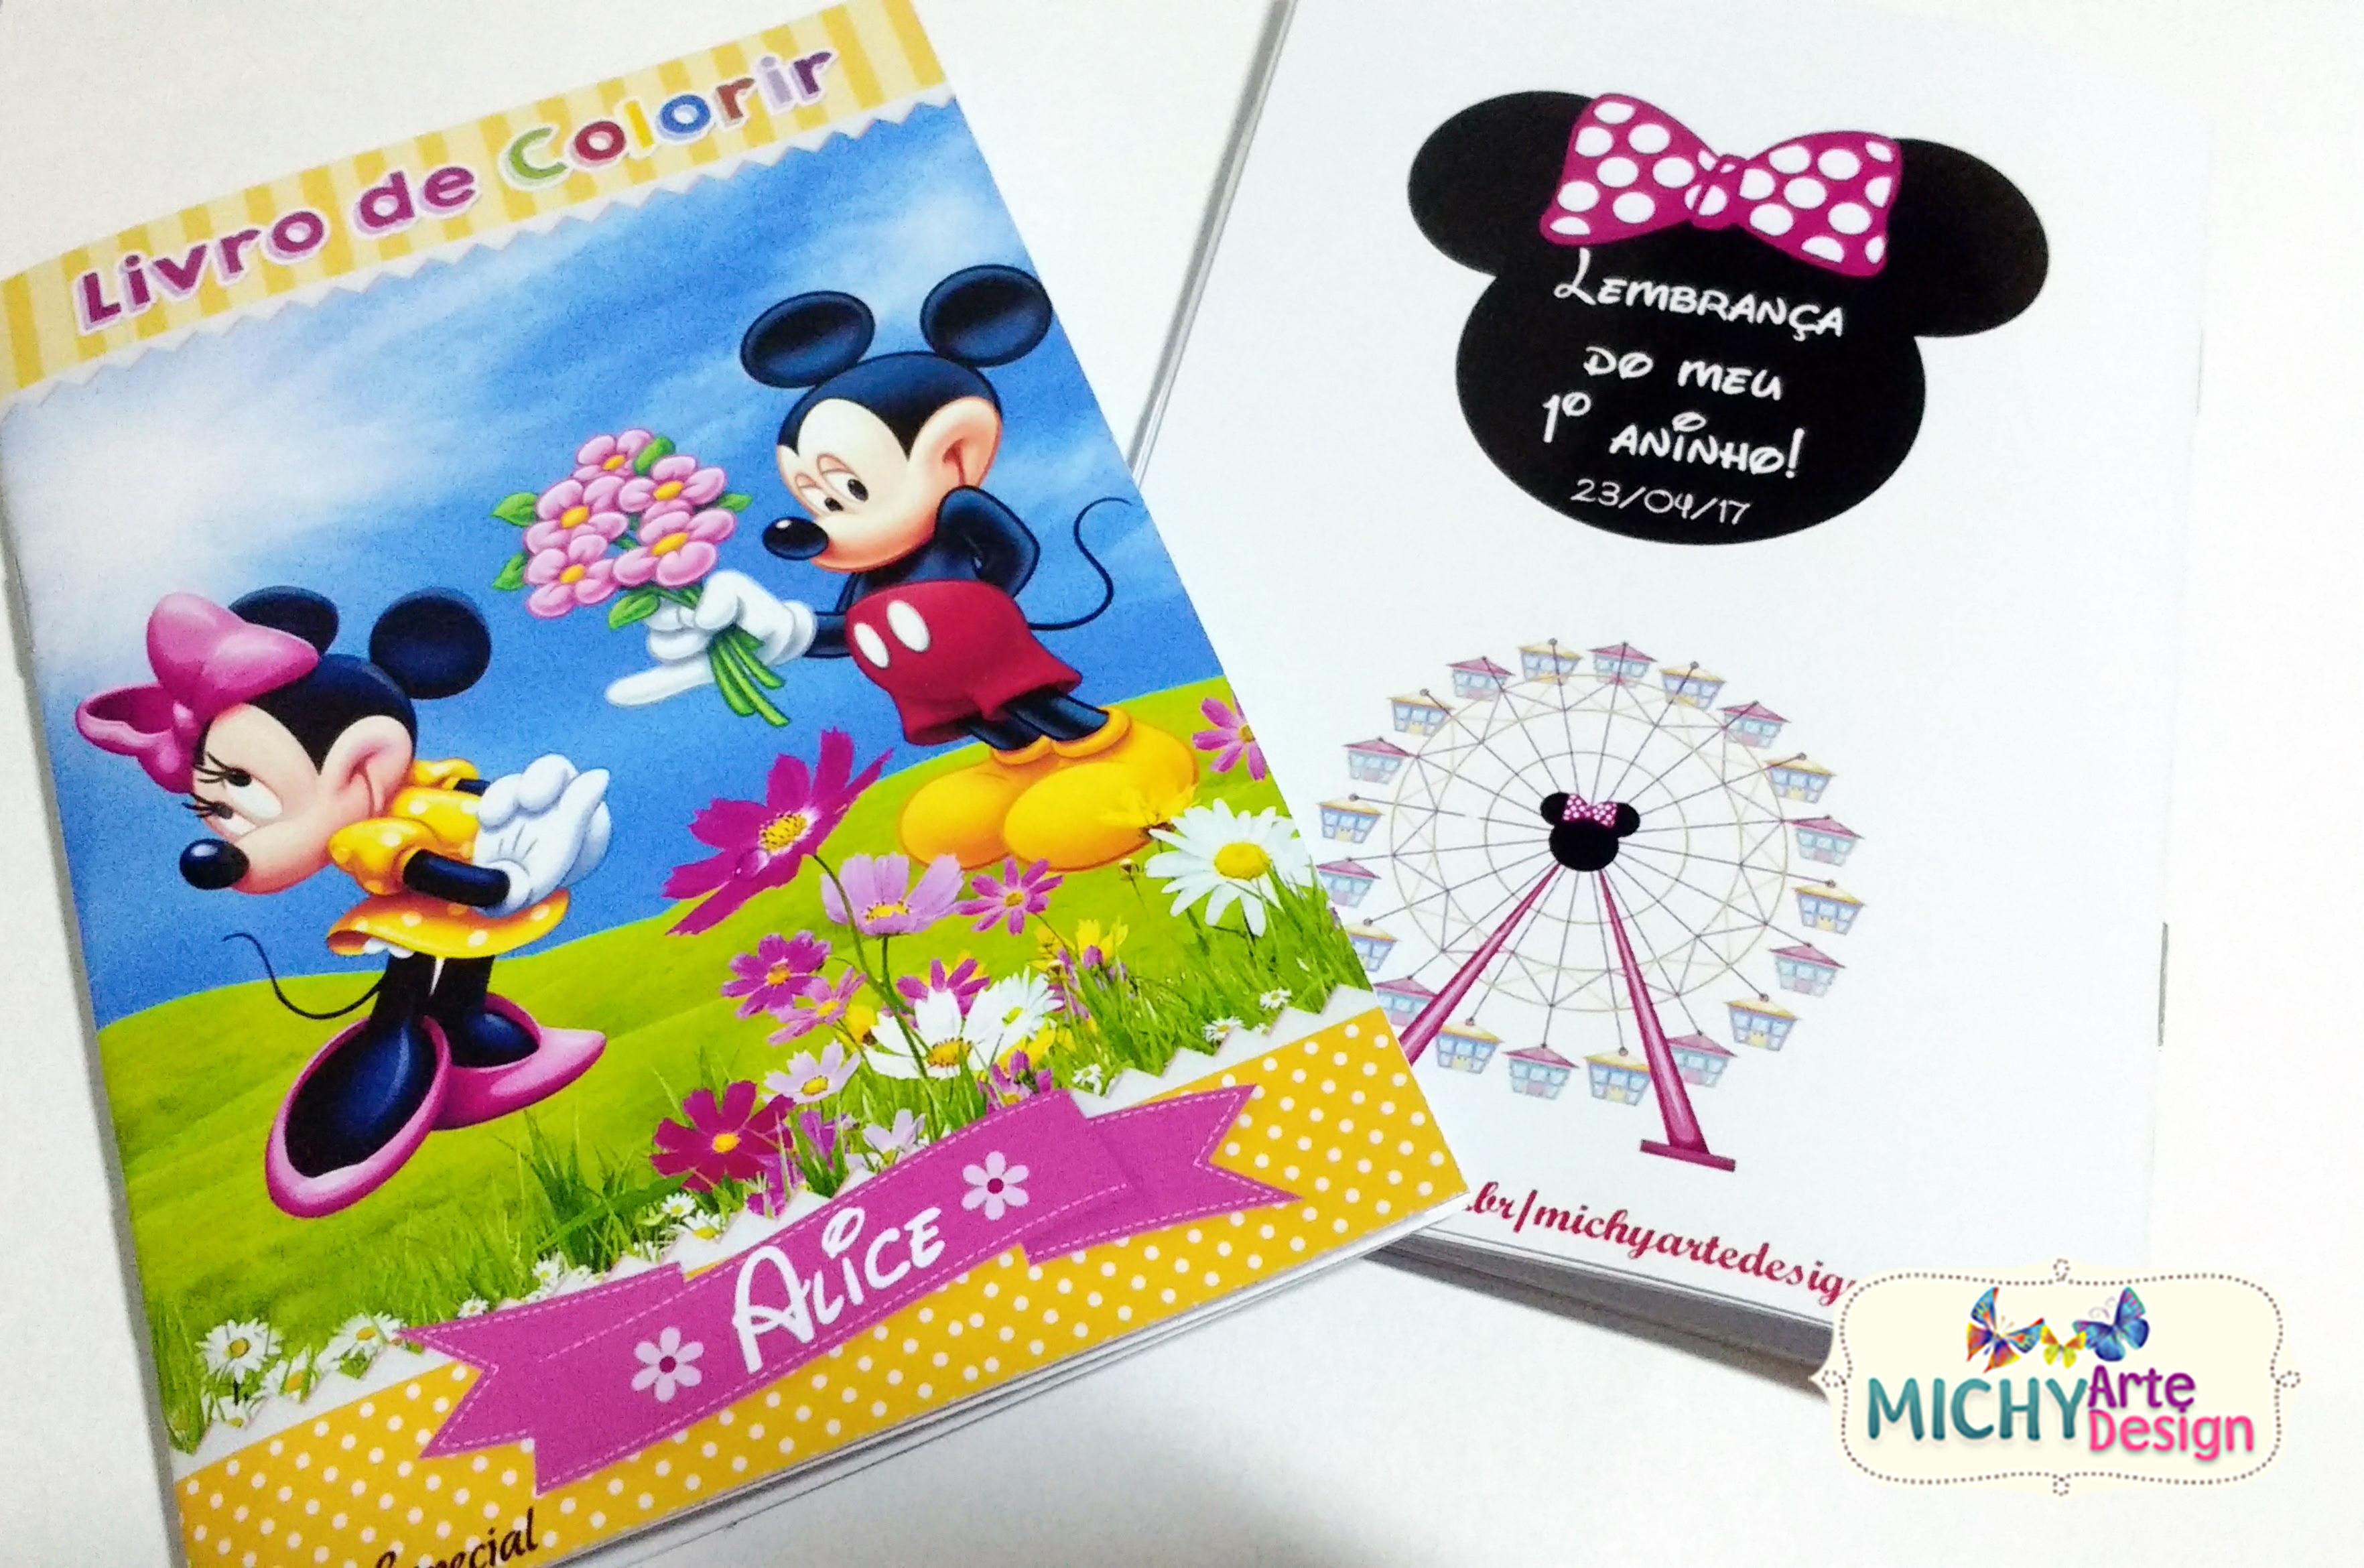 Mini Livro De Colorir Mickey E Minnie No Elo7 Michy Arte